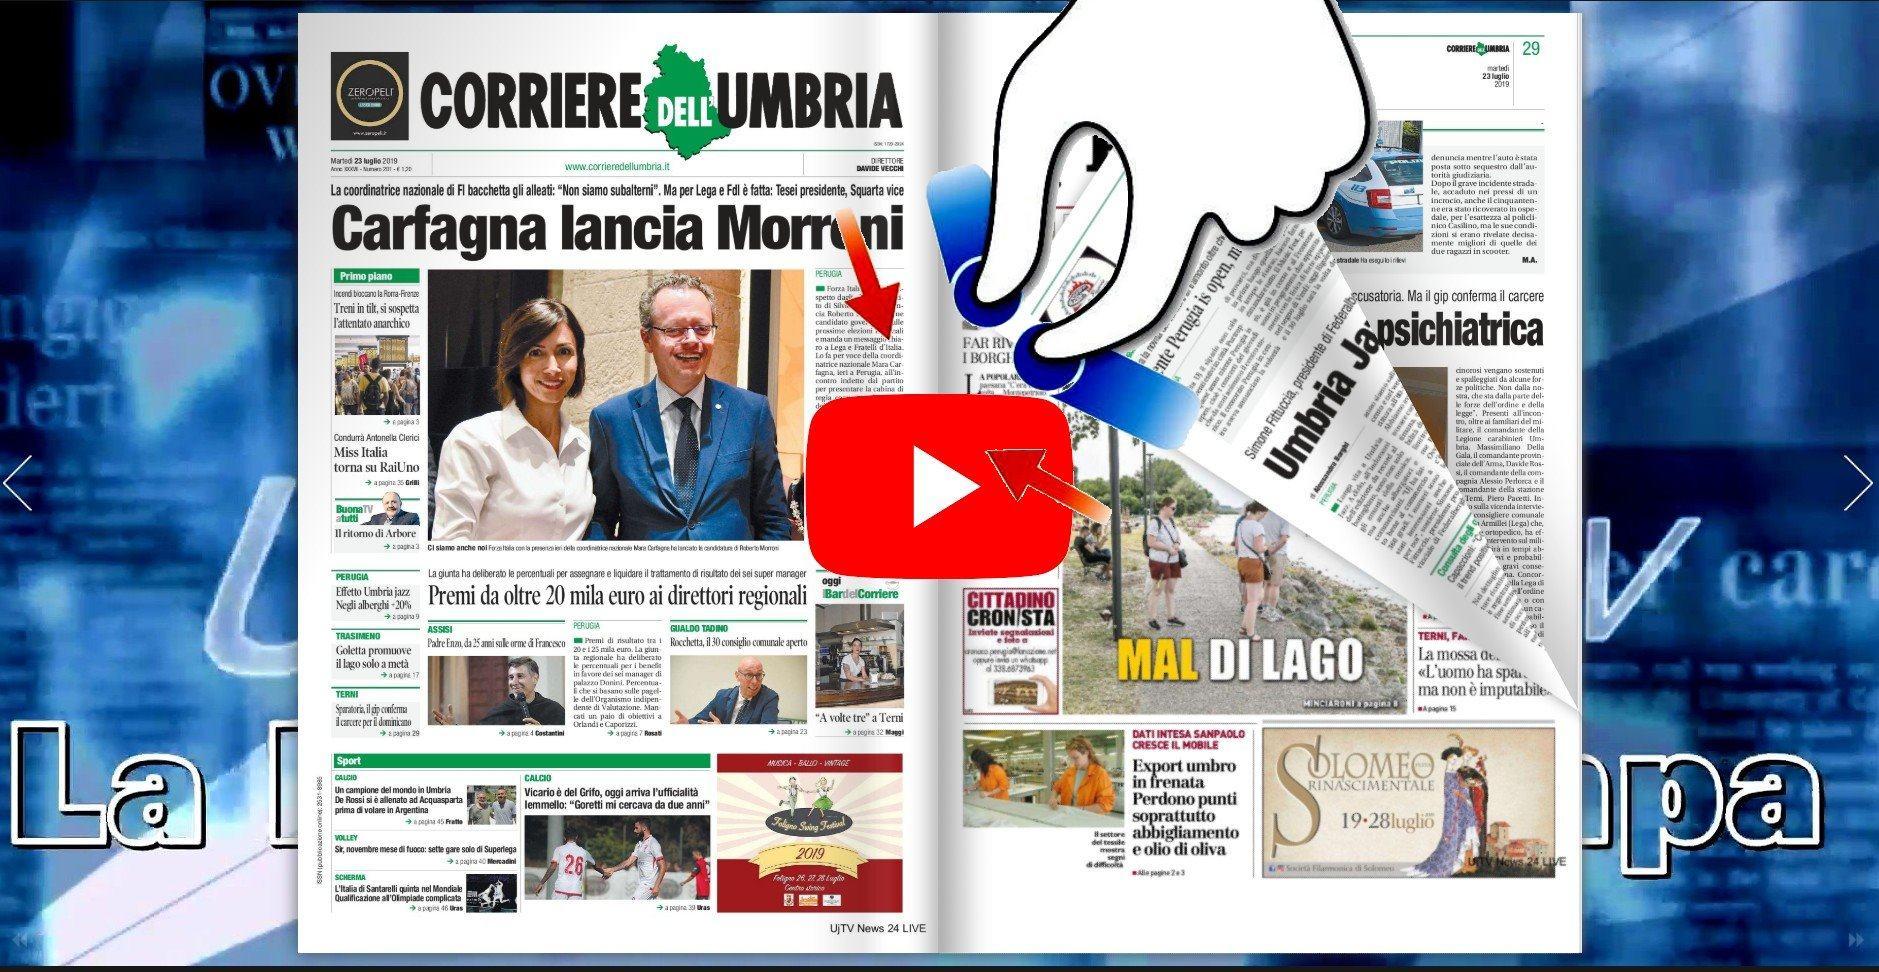 Rassegna stampa dell'Umbria martedì 23 luglio 2019 UjTV News24 LIVE